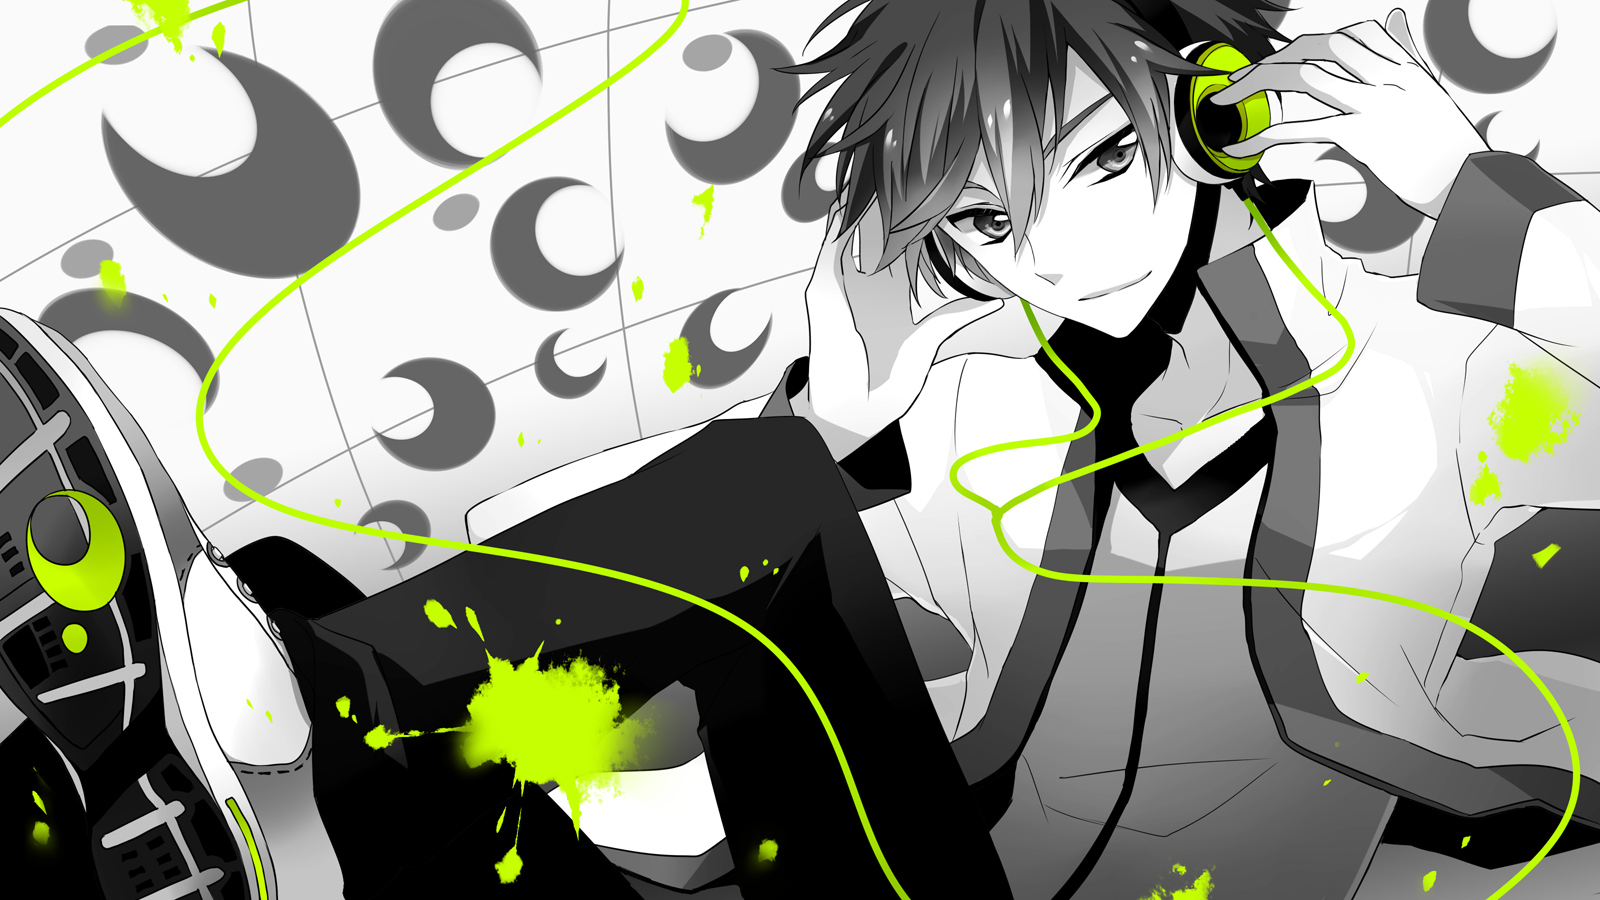 Anime Gamer Wallpaper Boy 2257563 Hd Wallpaper Backgrounds Download